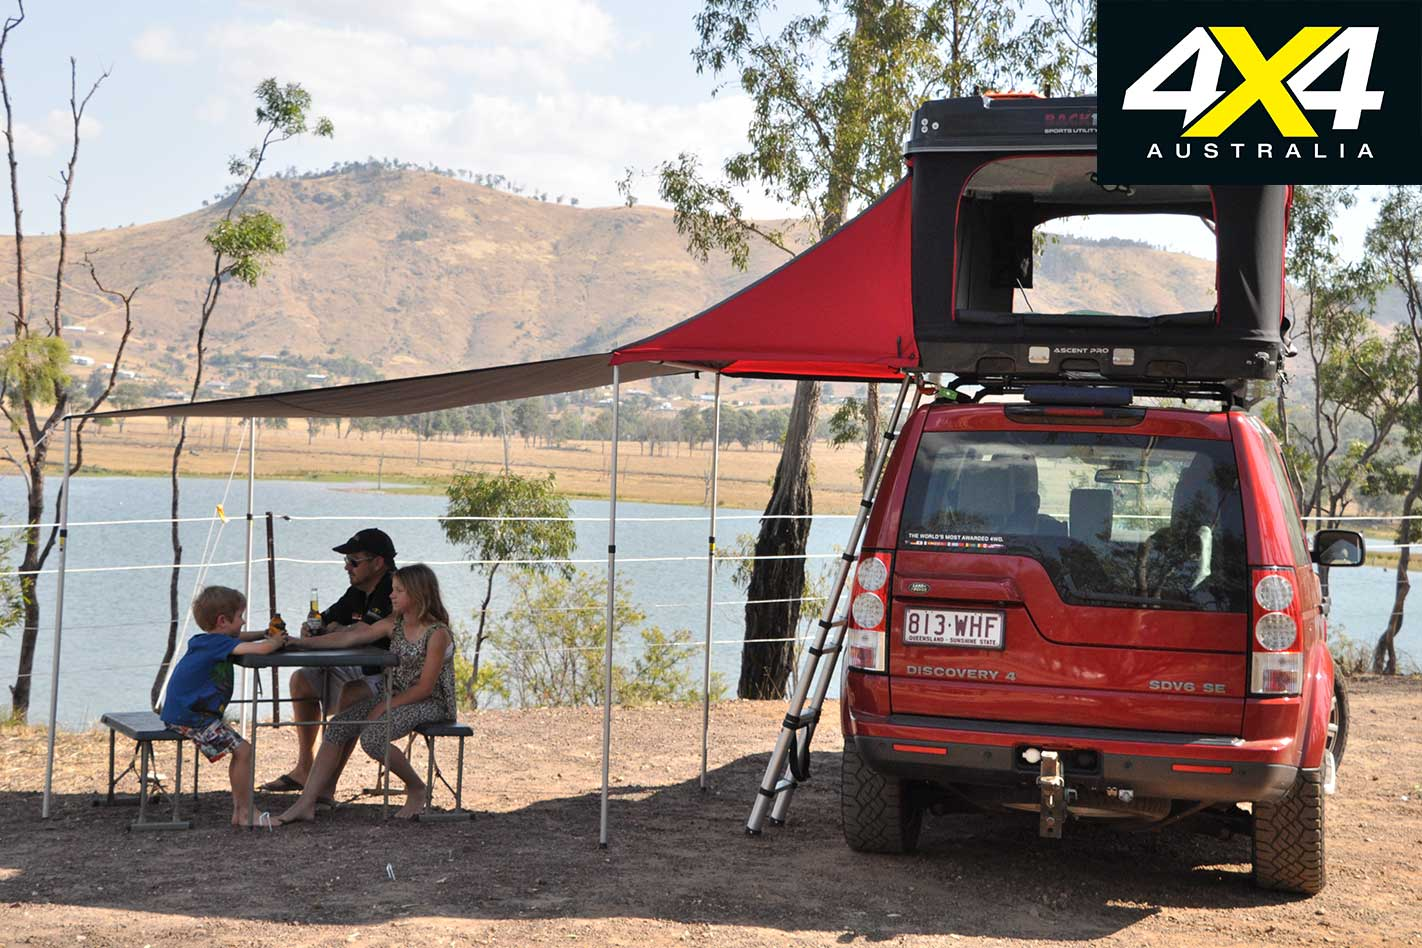 Rooftop Tent Buyers' Guide | 4X4 Australia